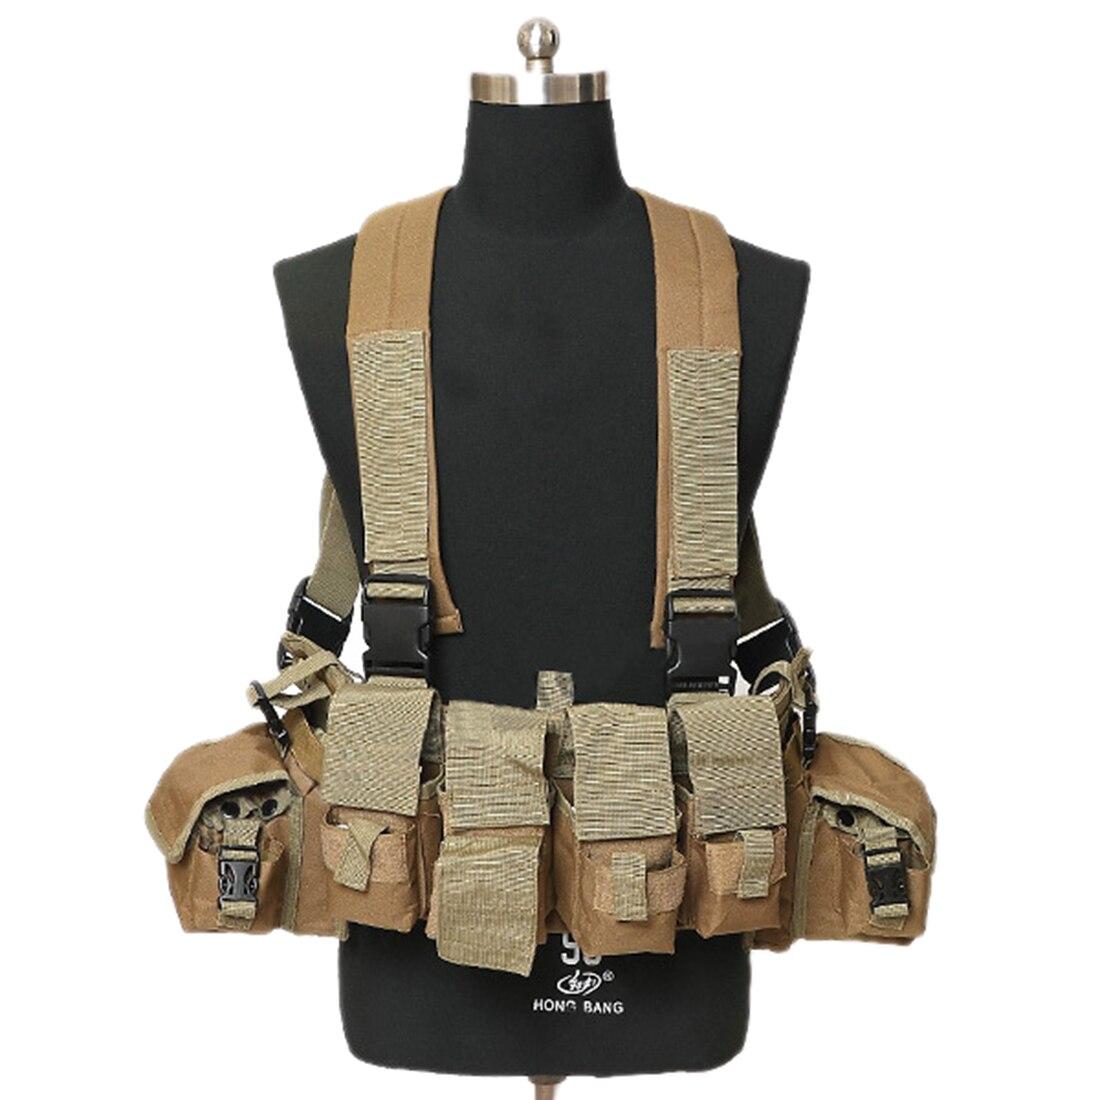 Leal 2019 Alta Calidad Multifunción Táctico Pecho Rig Cintura Cinturón Al Aire Libre Paintball Airsoft Caza Chaleco Bolsa Militar Molle